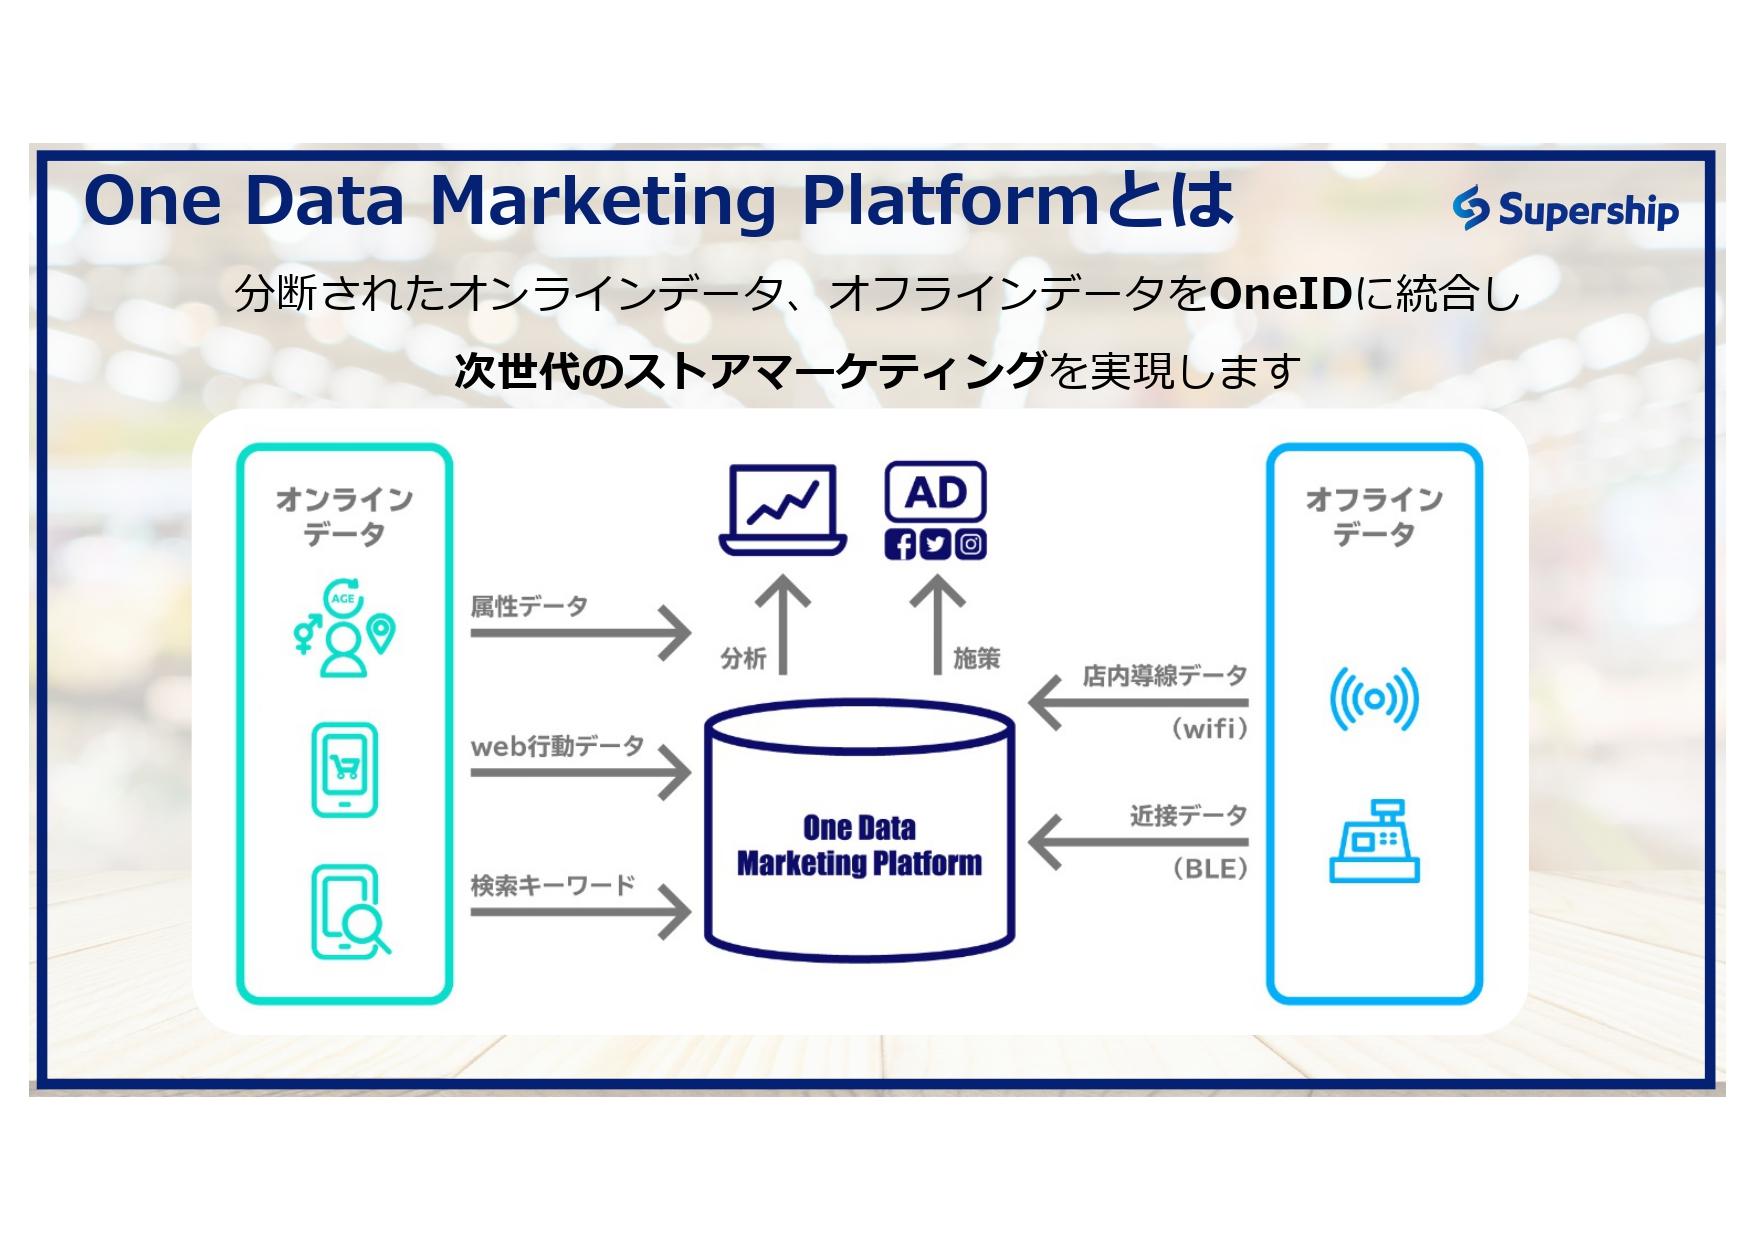 One Data Marketing Platformとは